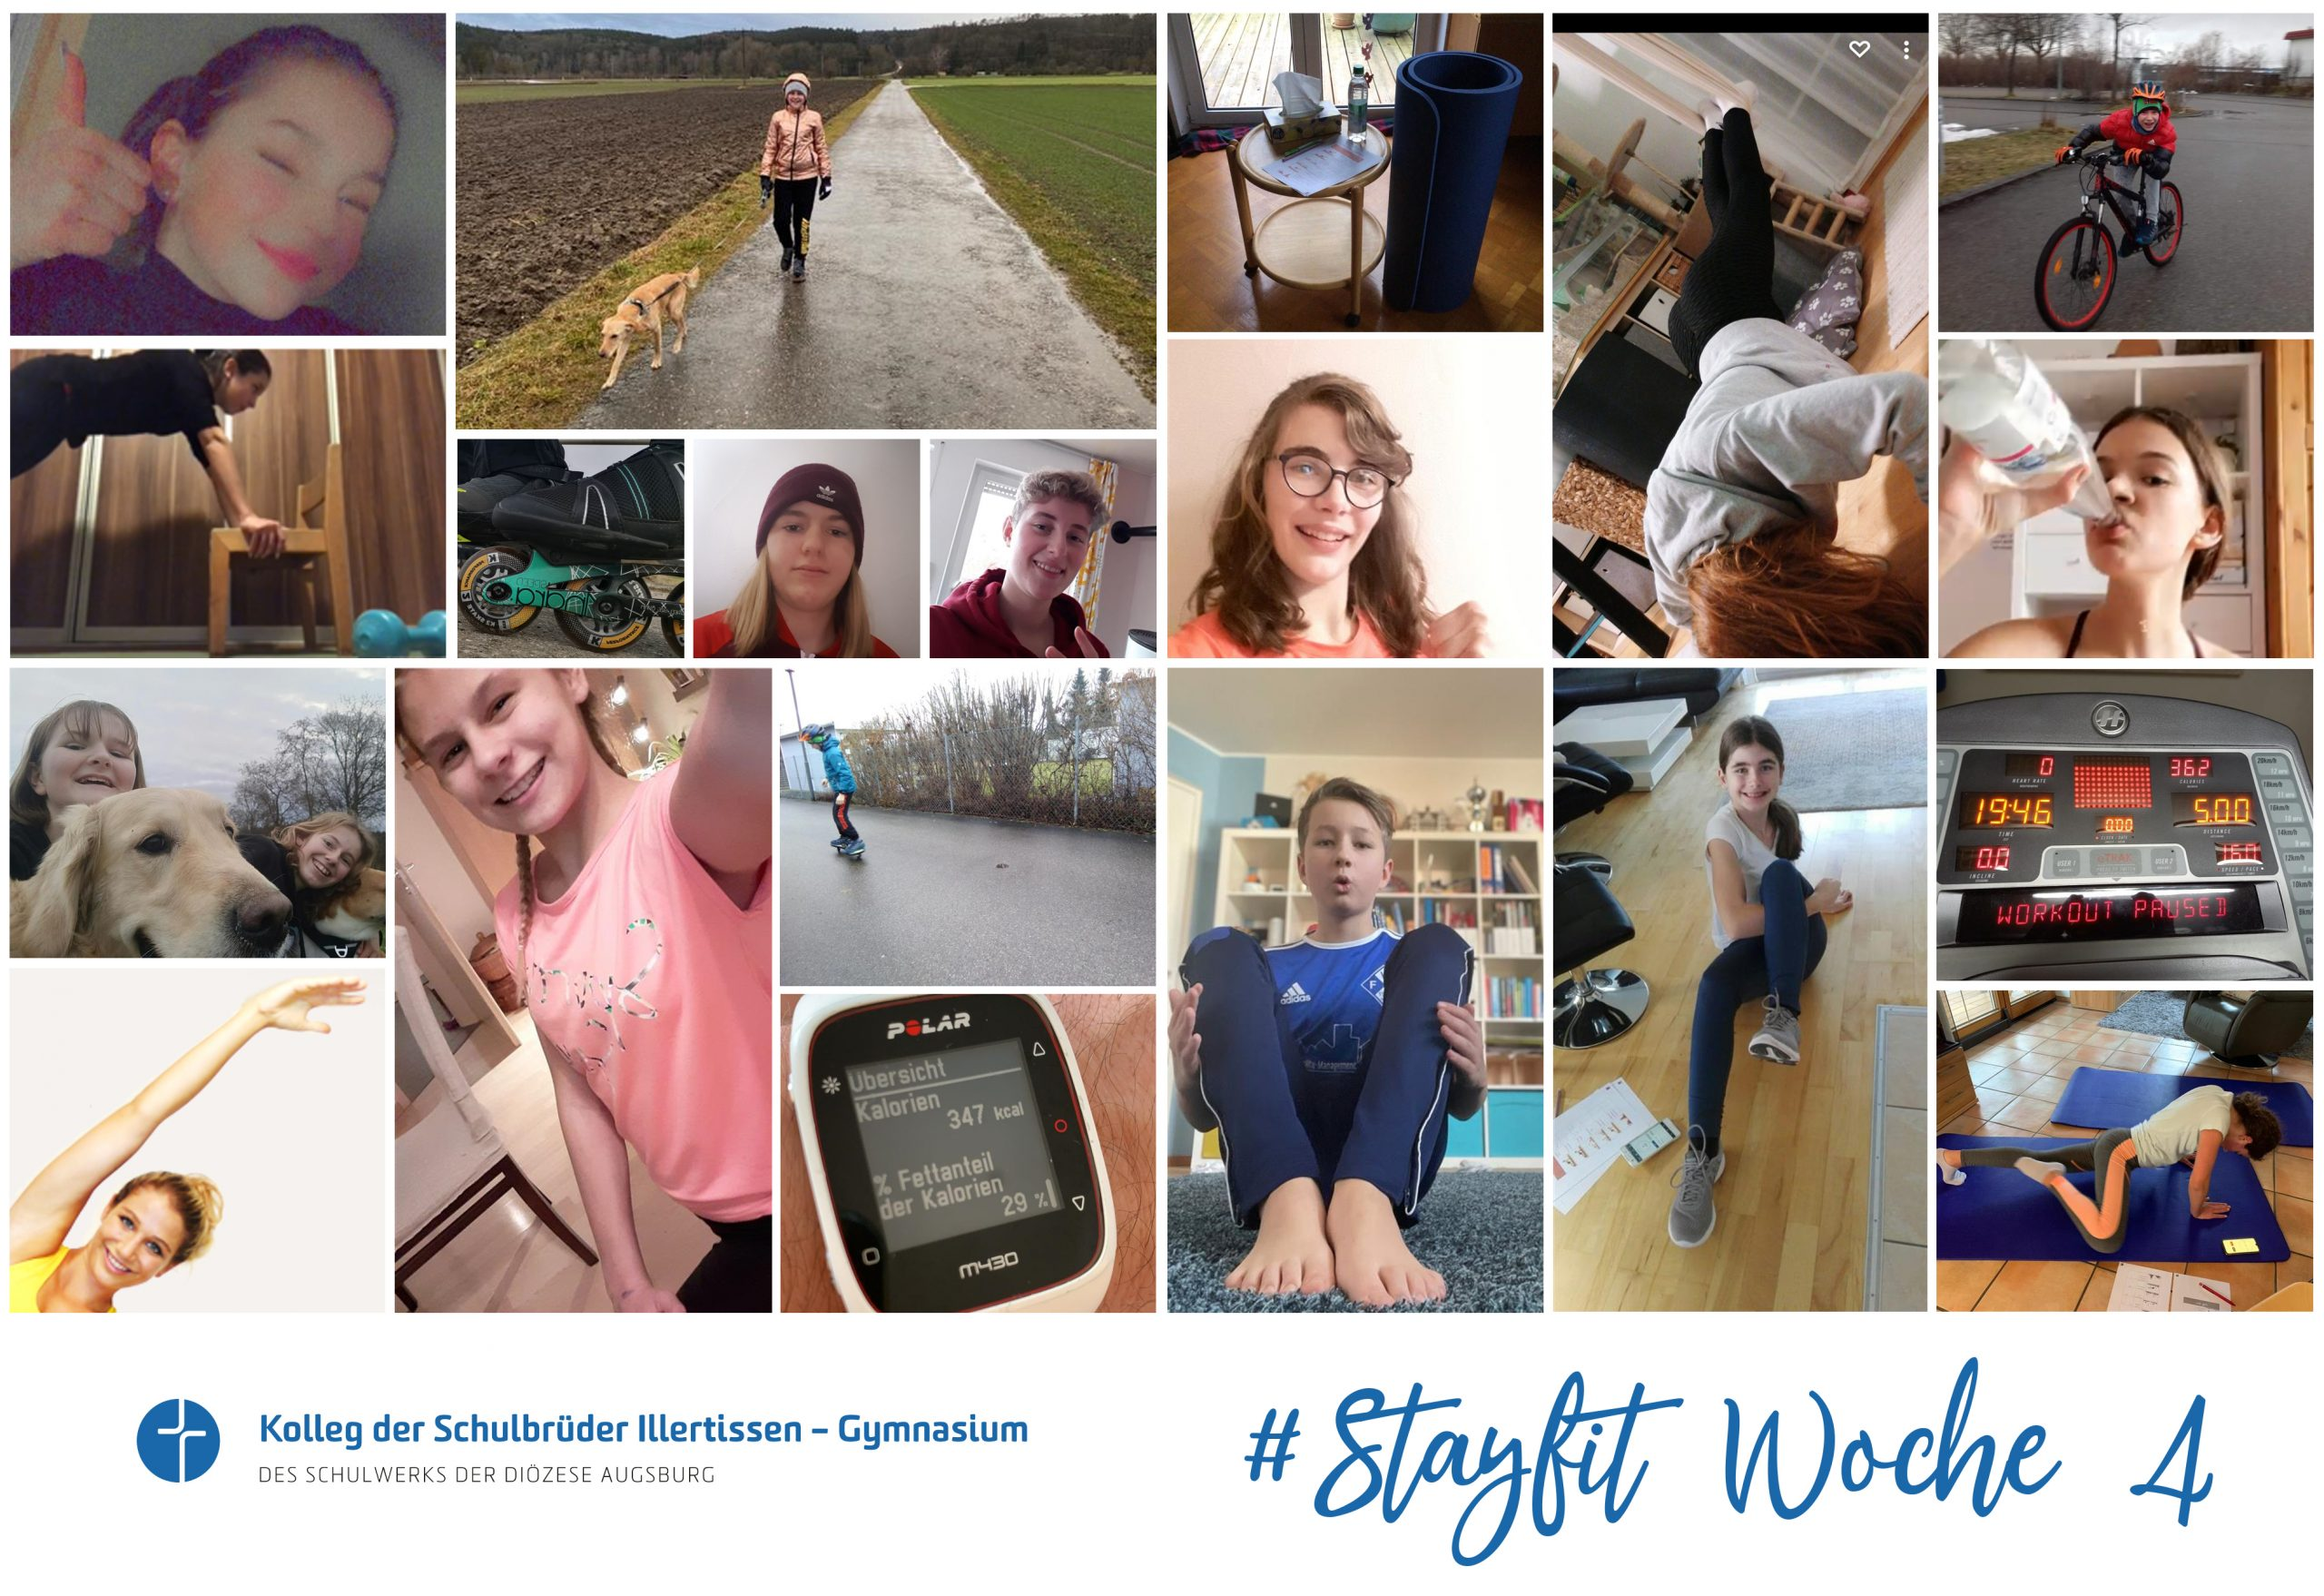 #stayfit Woche 4